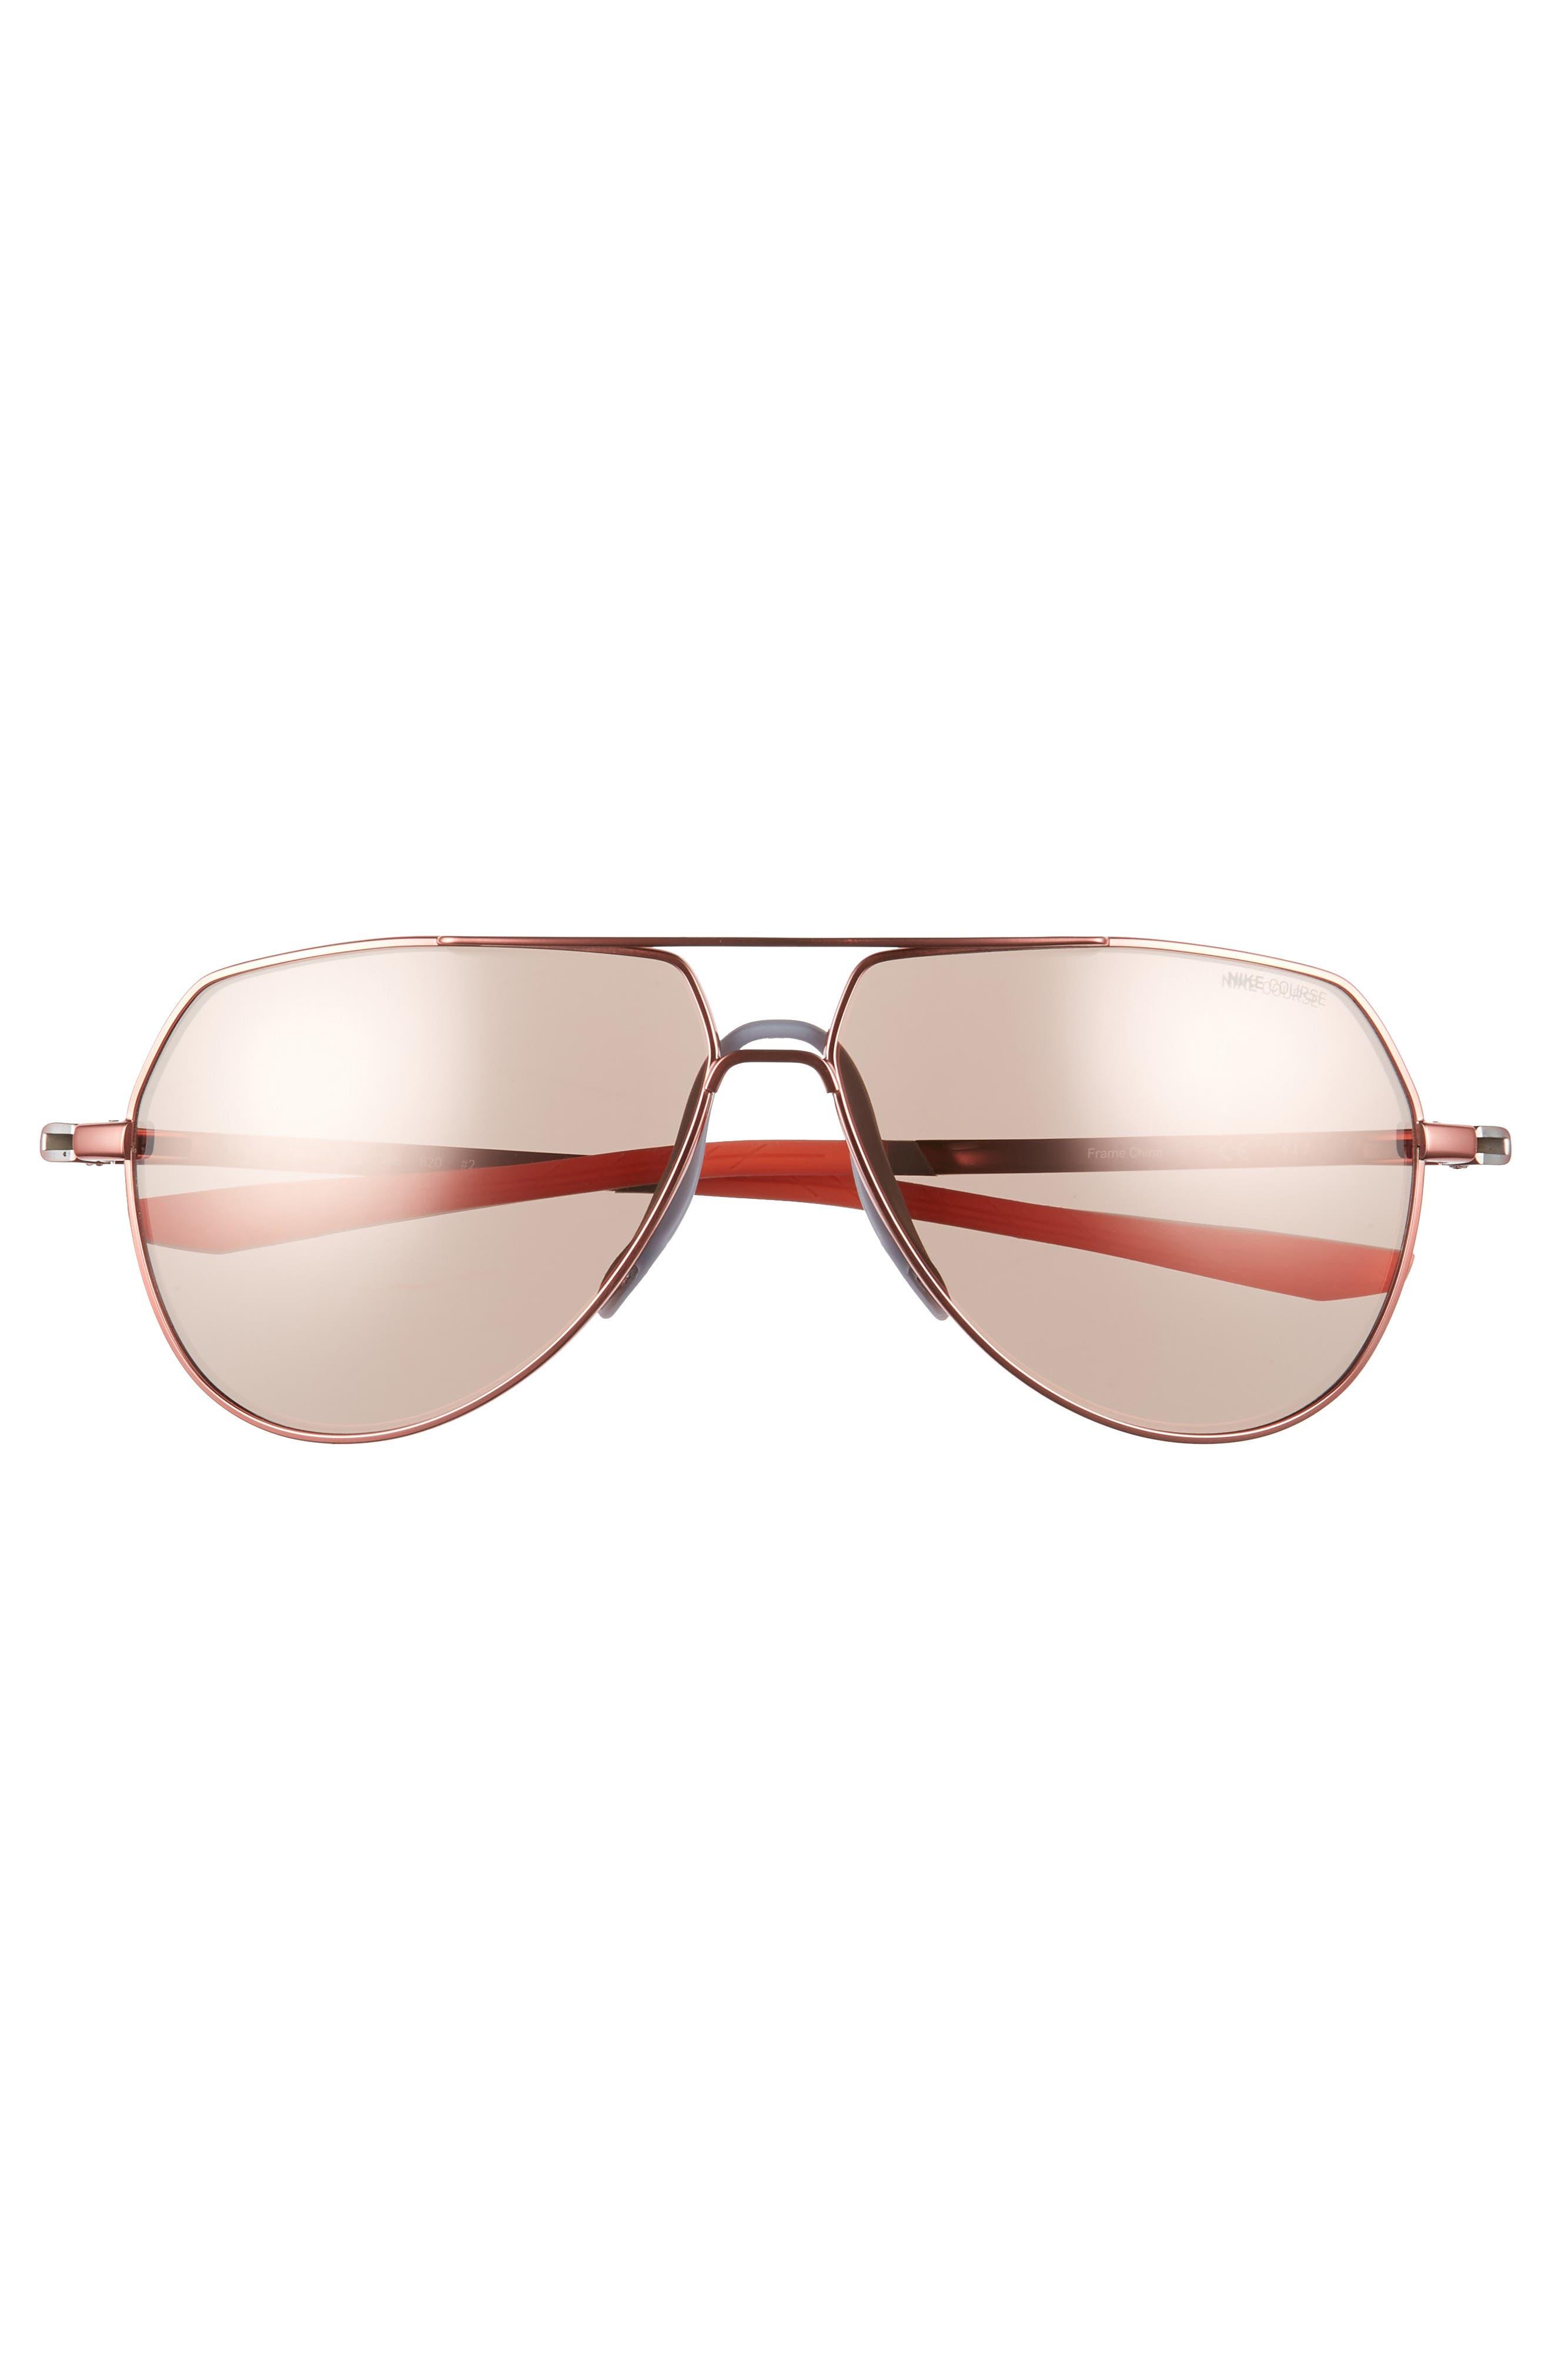 Outrider E 62mm Oversize Aviator Sunglasses,                             Alternate thumbnail 2, color,                             Total Crimson/ Golf